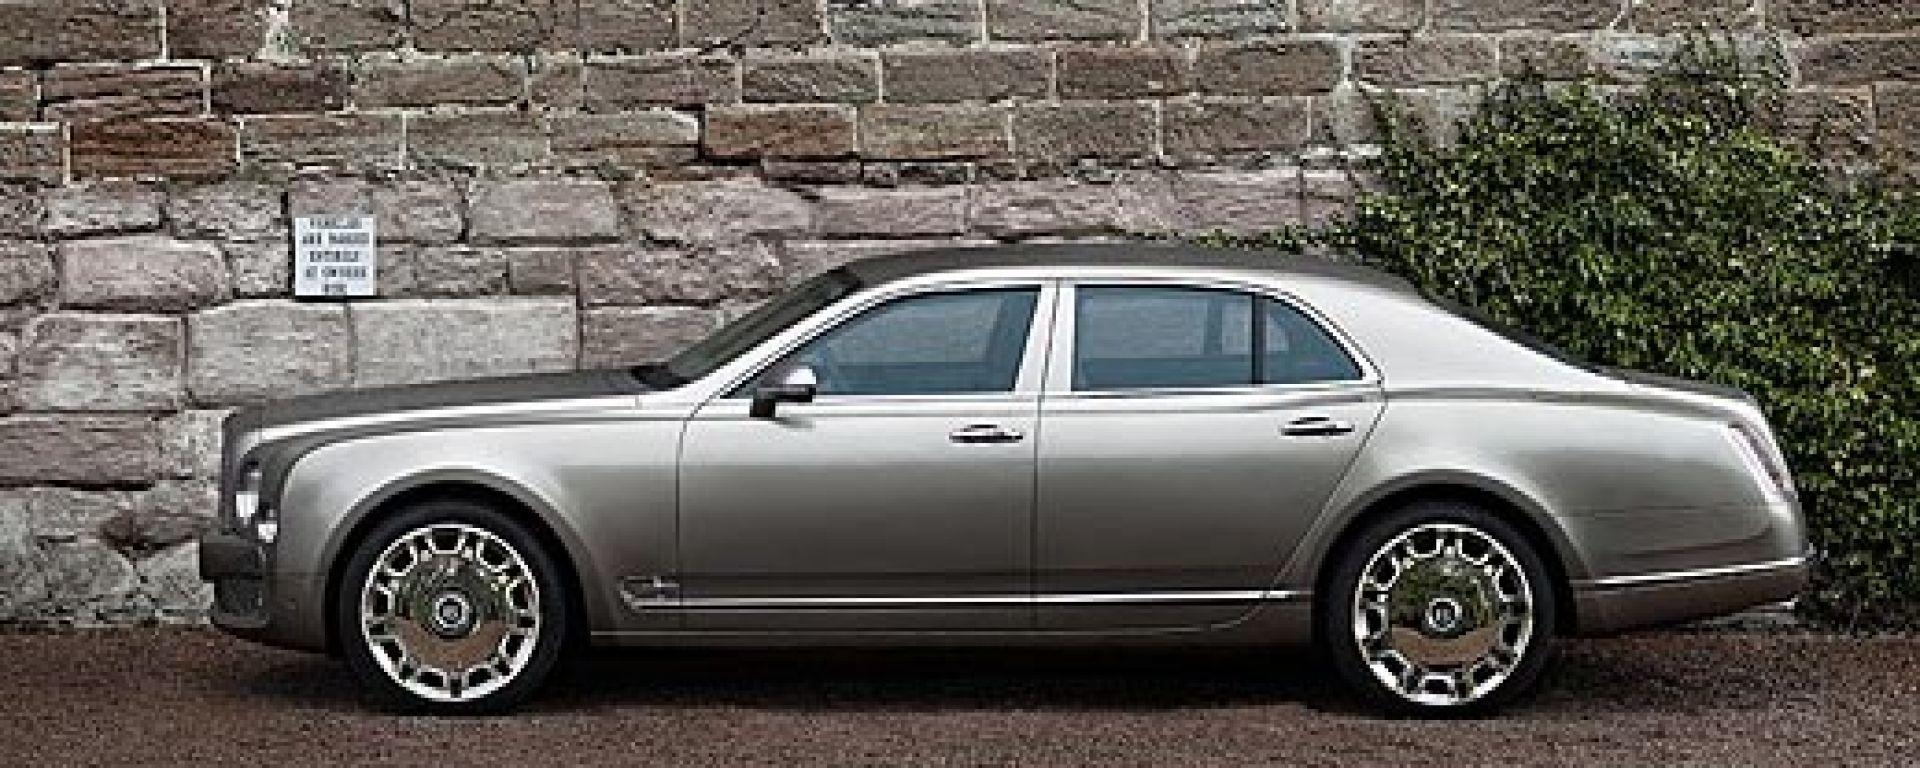 Bentley Mulsanne: abitacolo a cinque stelle